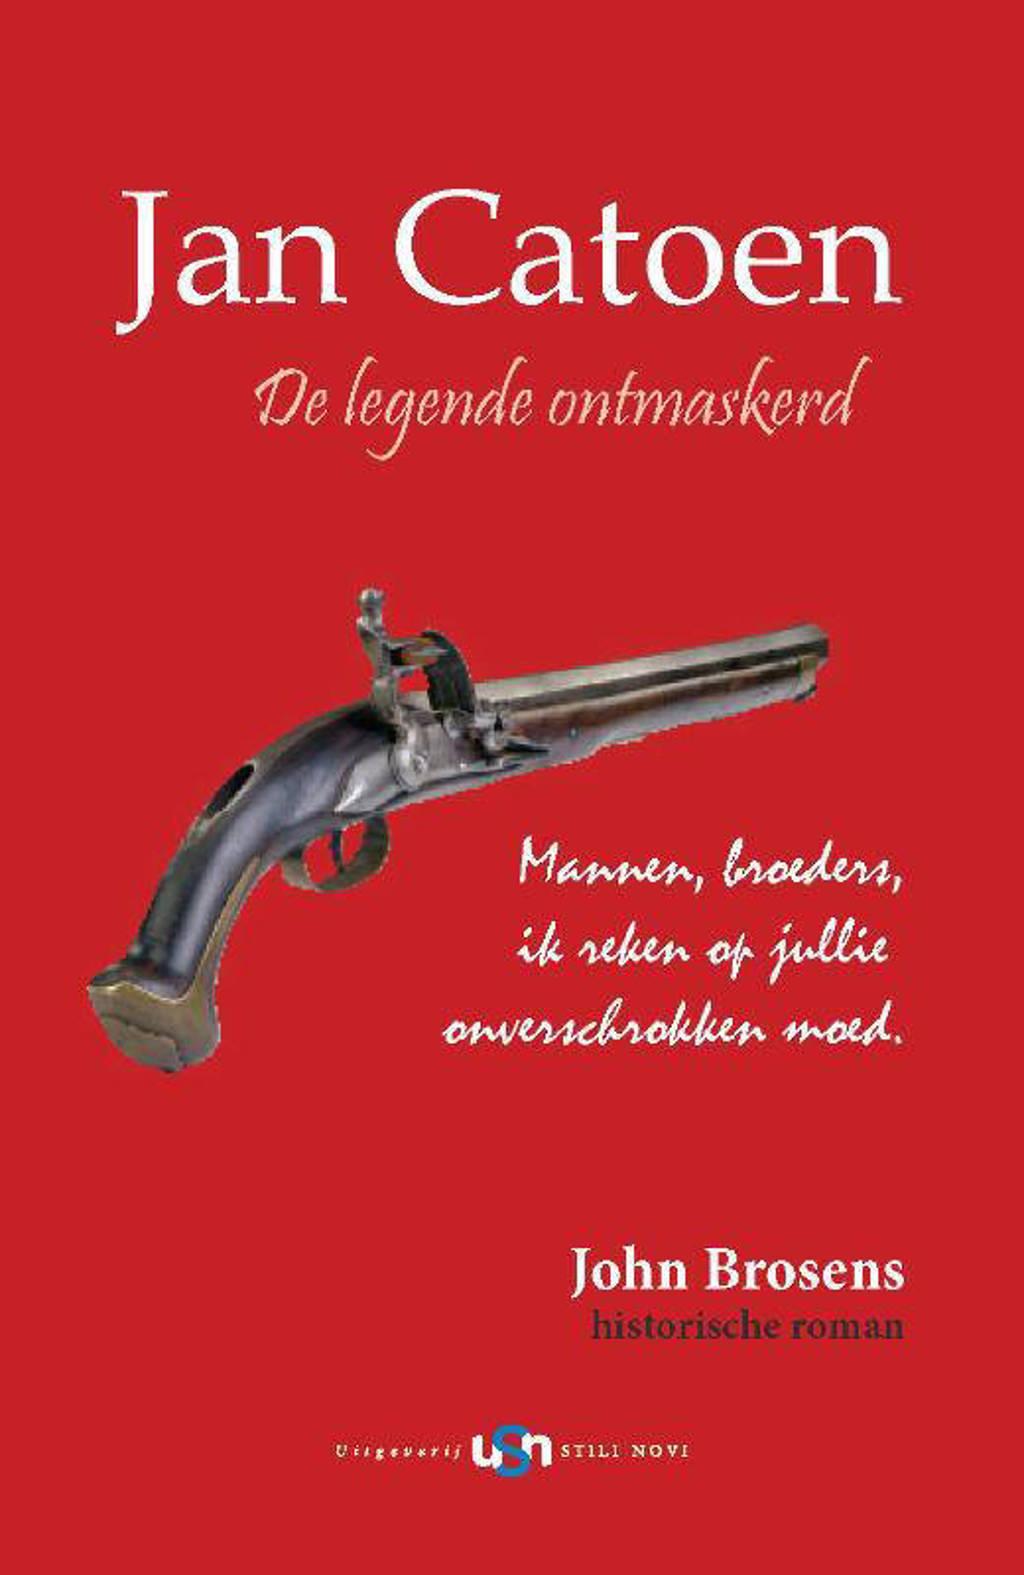 Jan Catoen - John Brosens